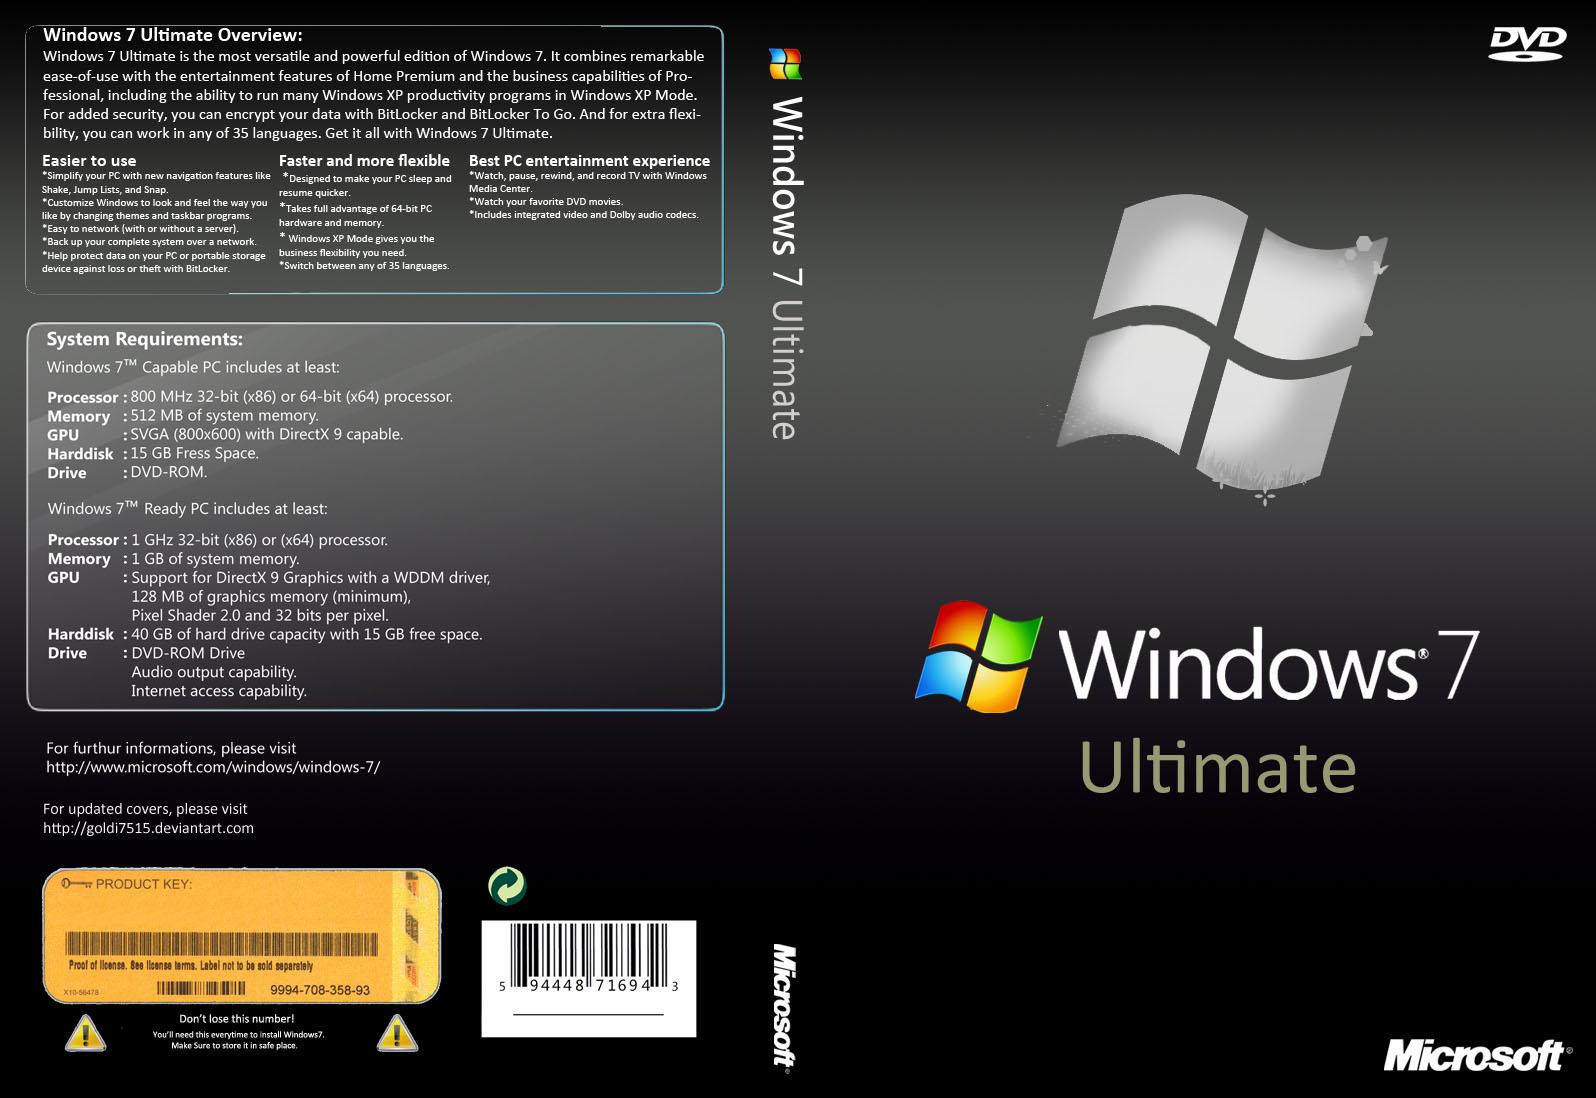 windows 7 ultimate sp1 en espa ol iso original identi. Black Bedroom Furniture Sets. Home Design Ideas